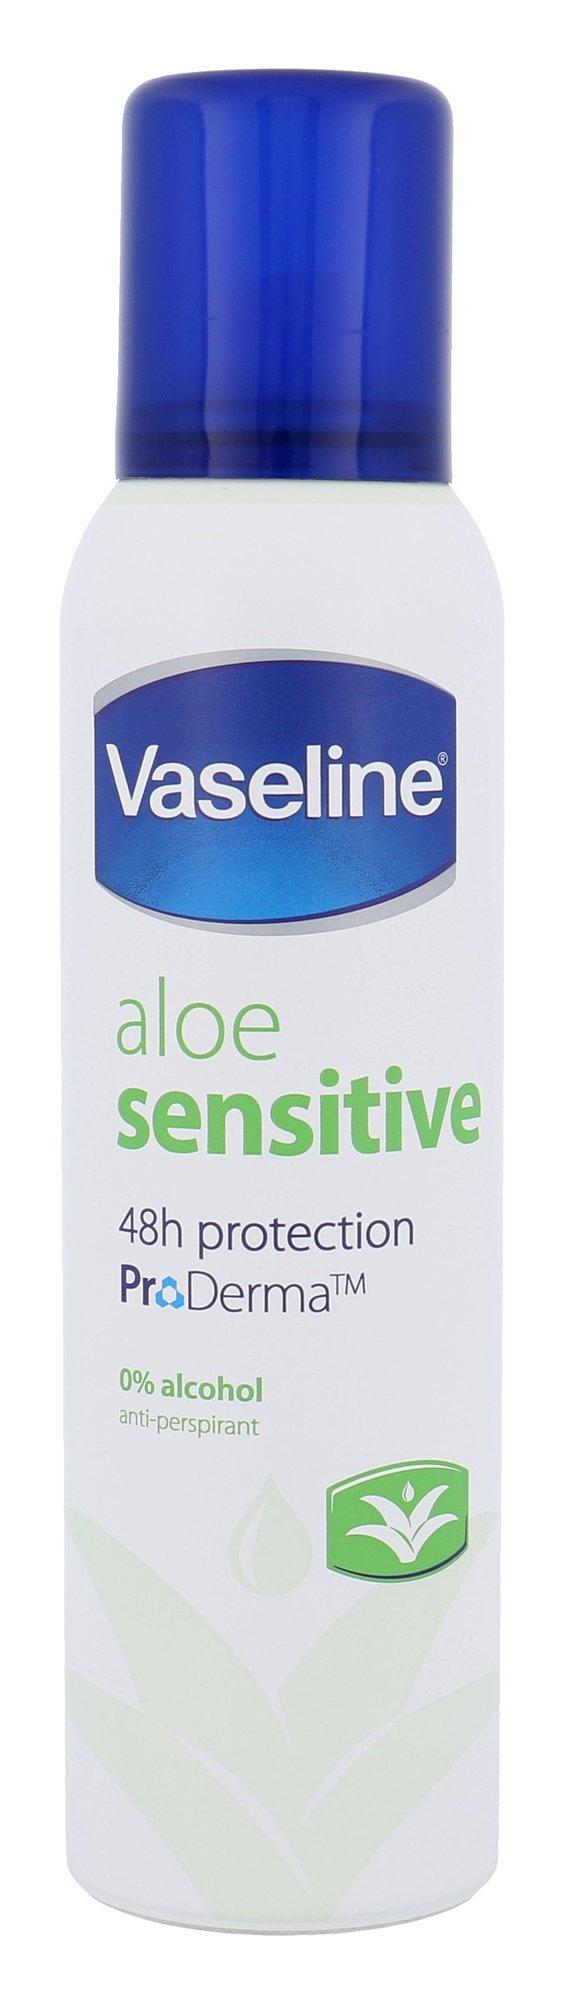 Vaseline Aloe Sensitive Anti-Perspirant 48h Deospray Cosmetic 150ml